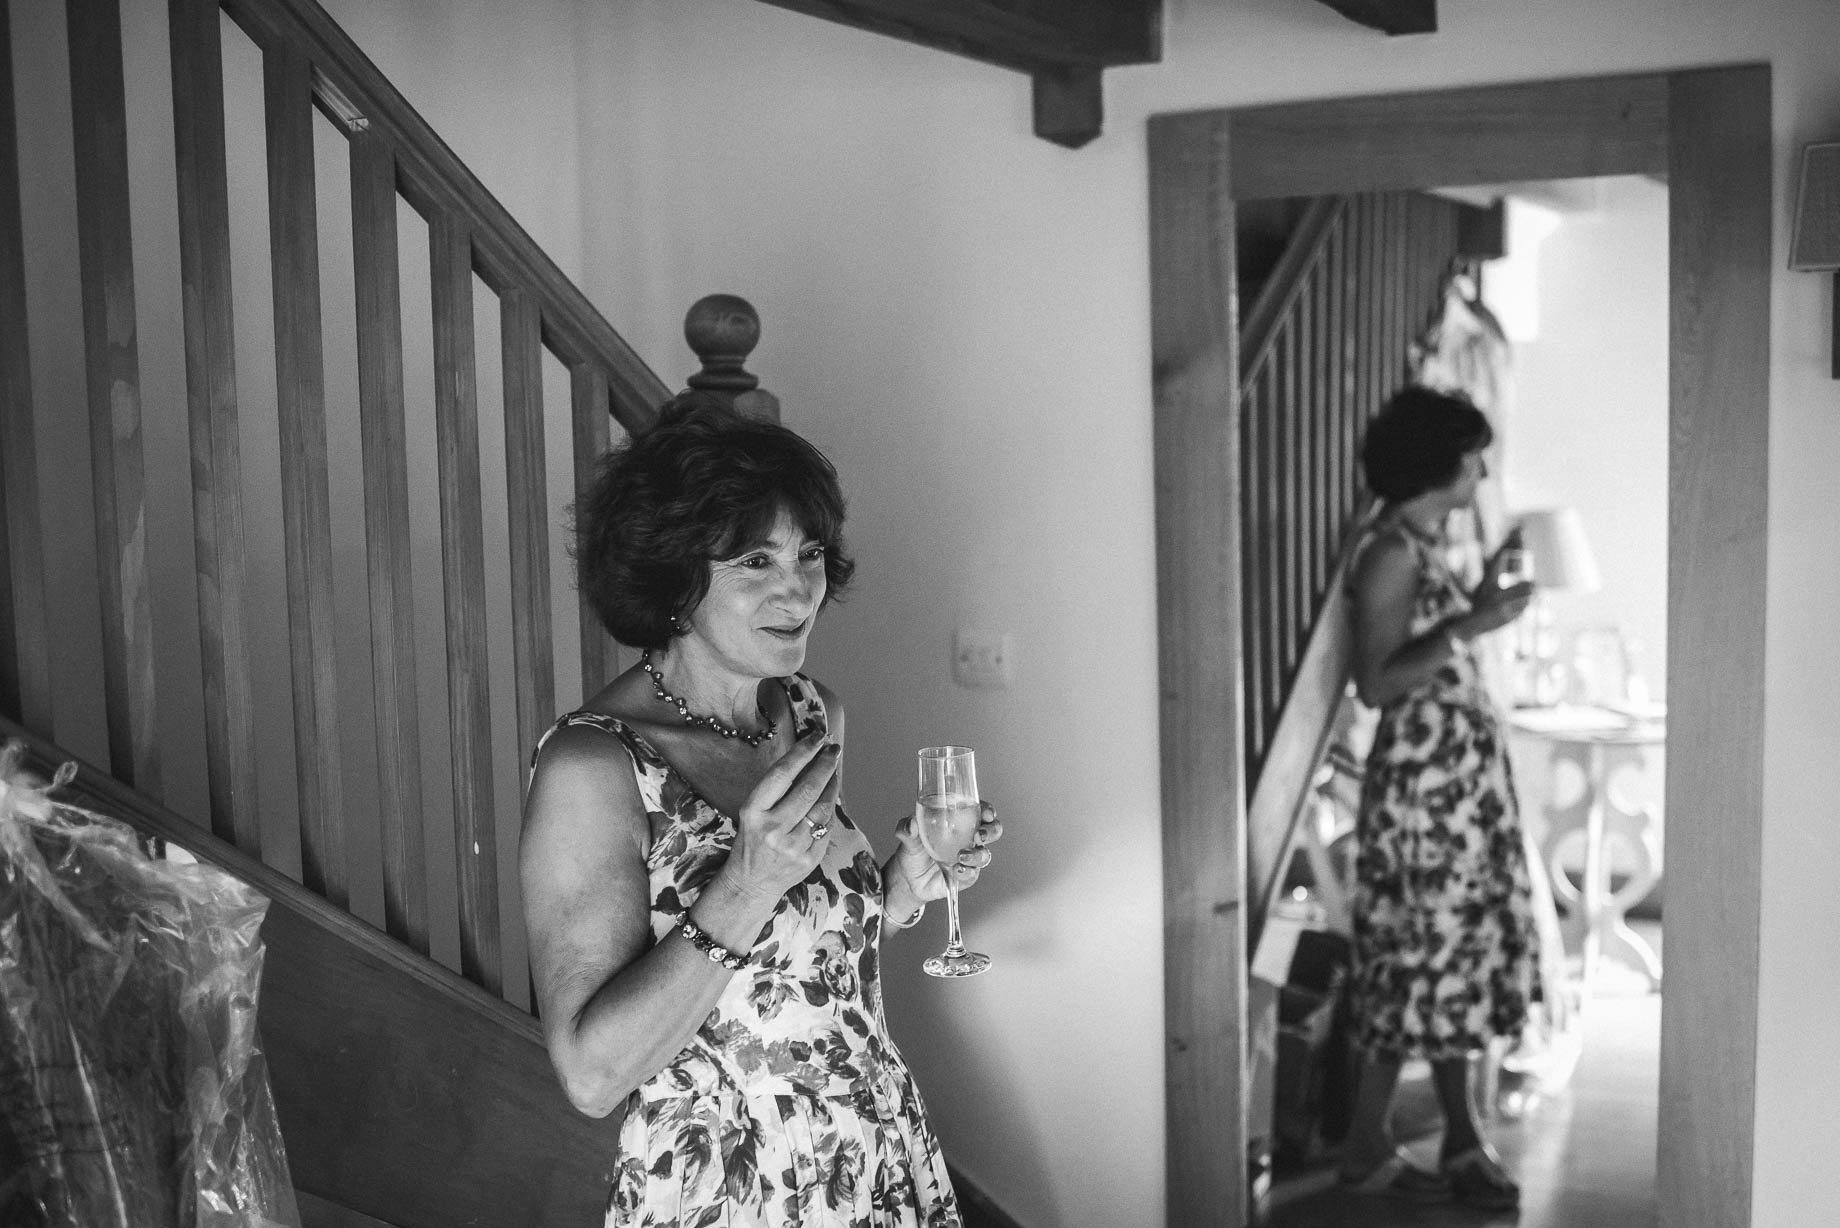 Gaynes Park wedding photography - Guy Collier Photography - Rachel and Jon (26 of 169)